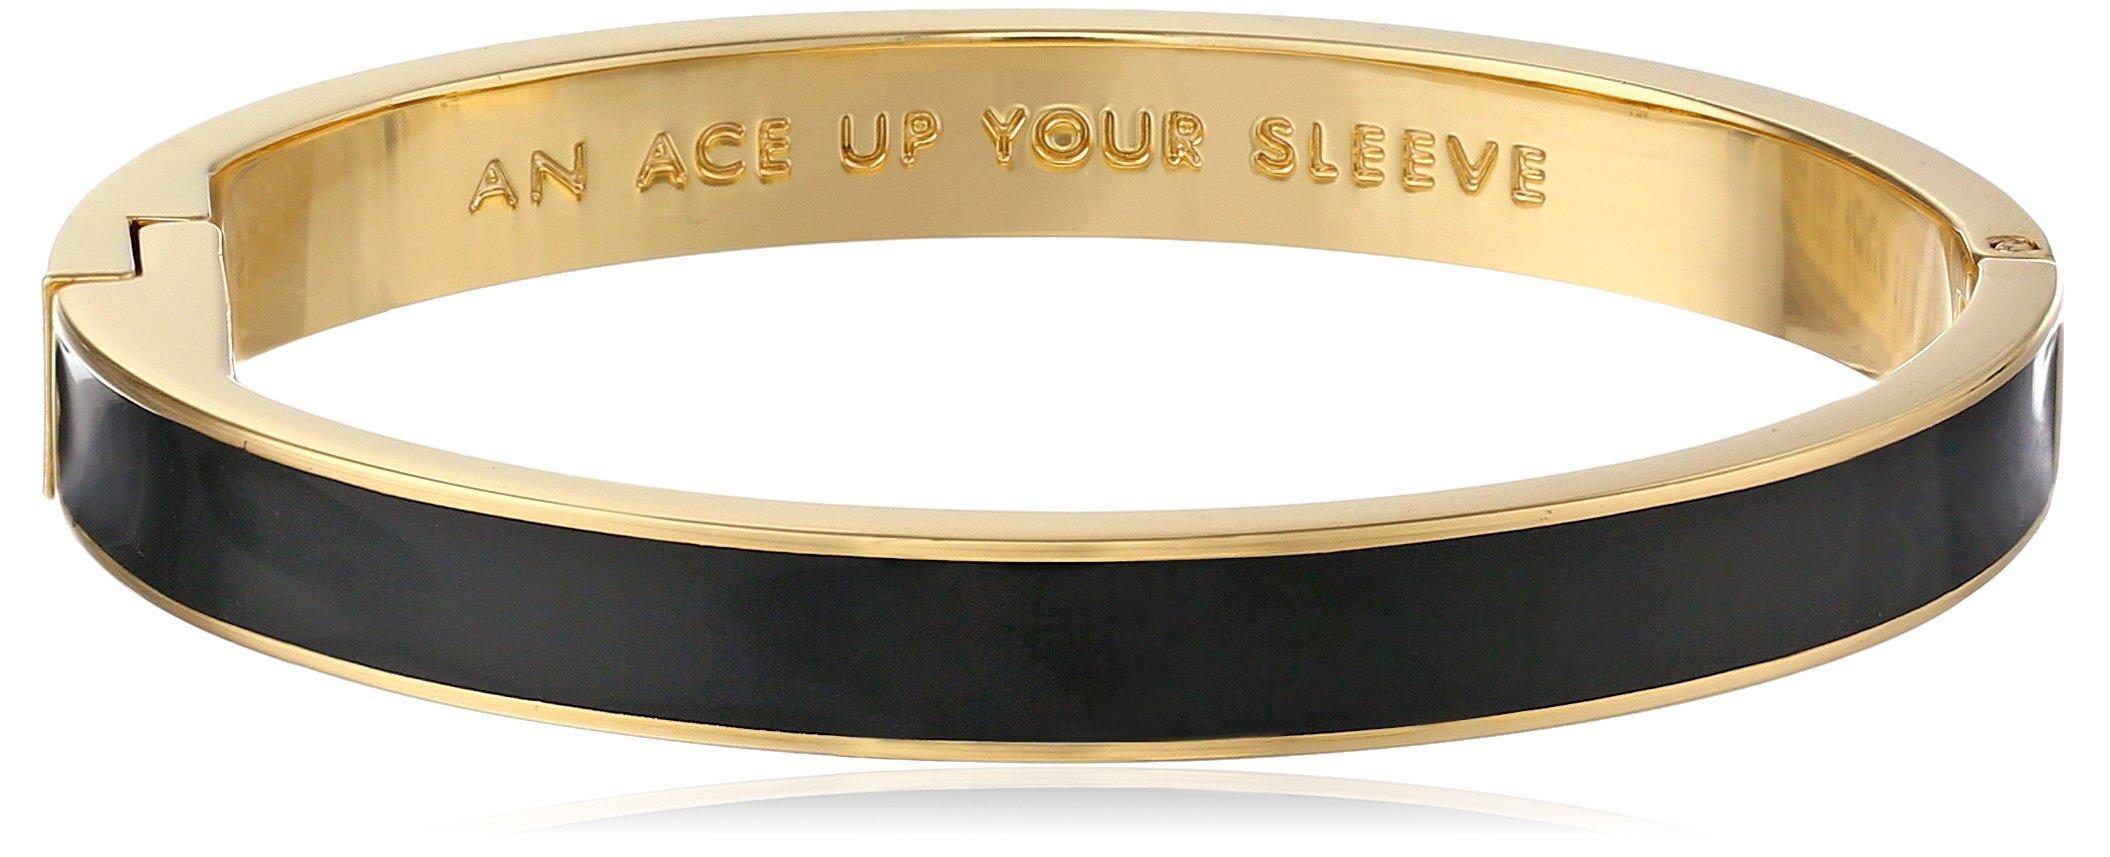 Kate Spade New York Idiom Bangles Ace Up Your Sleeve Hinged Bracelet